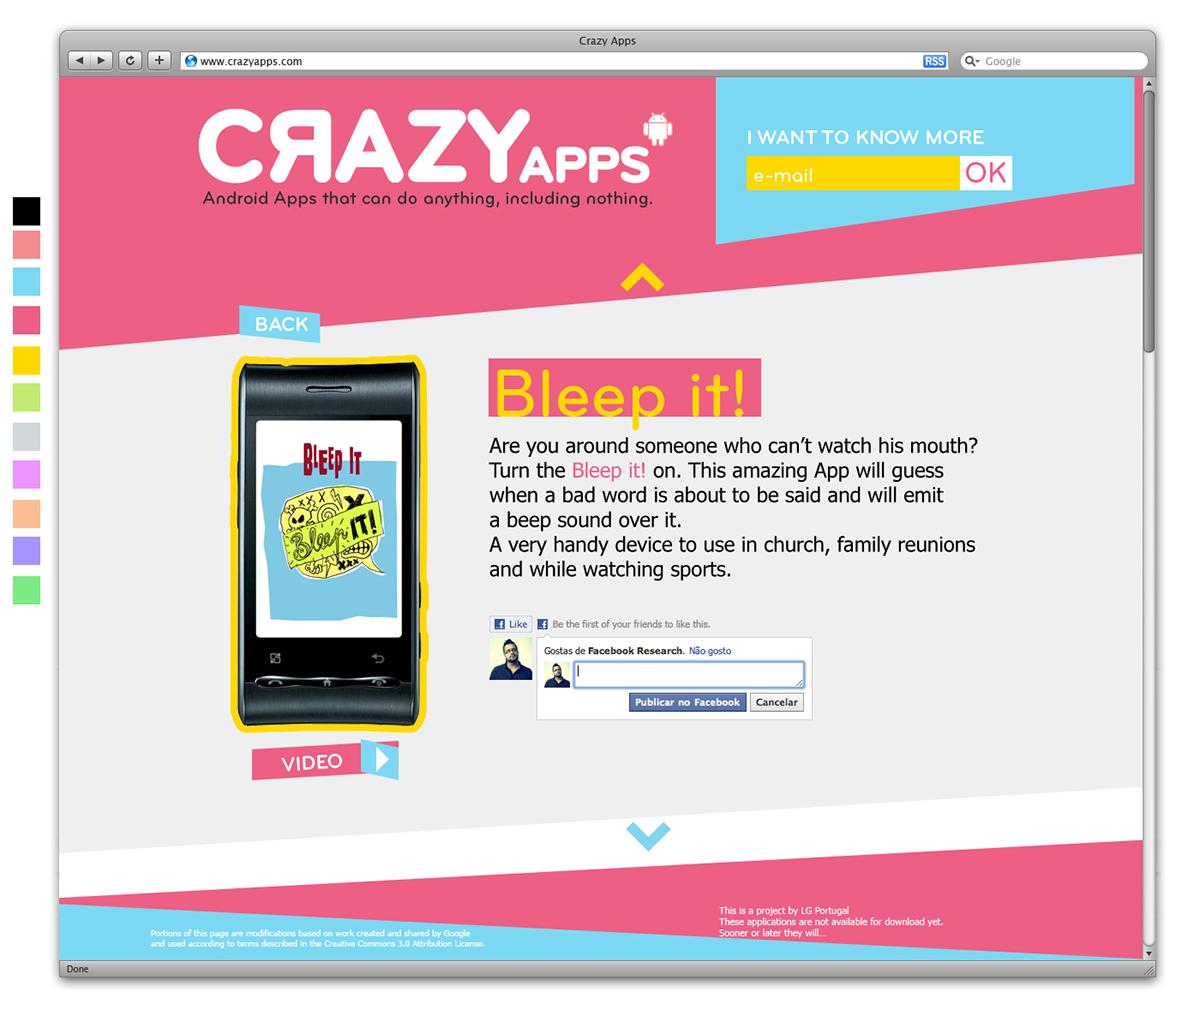 LG Crazy Apps on Behance